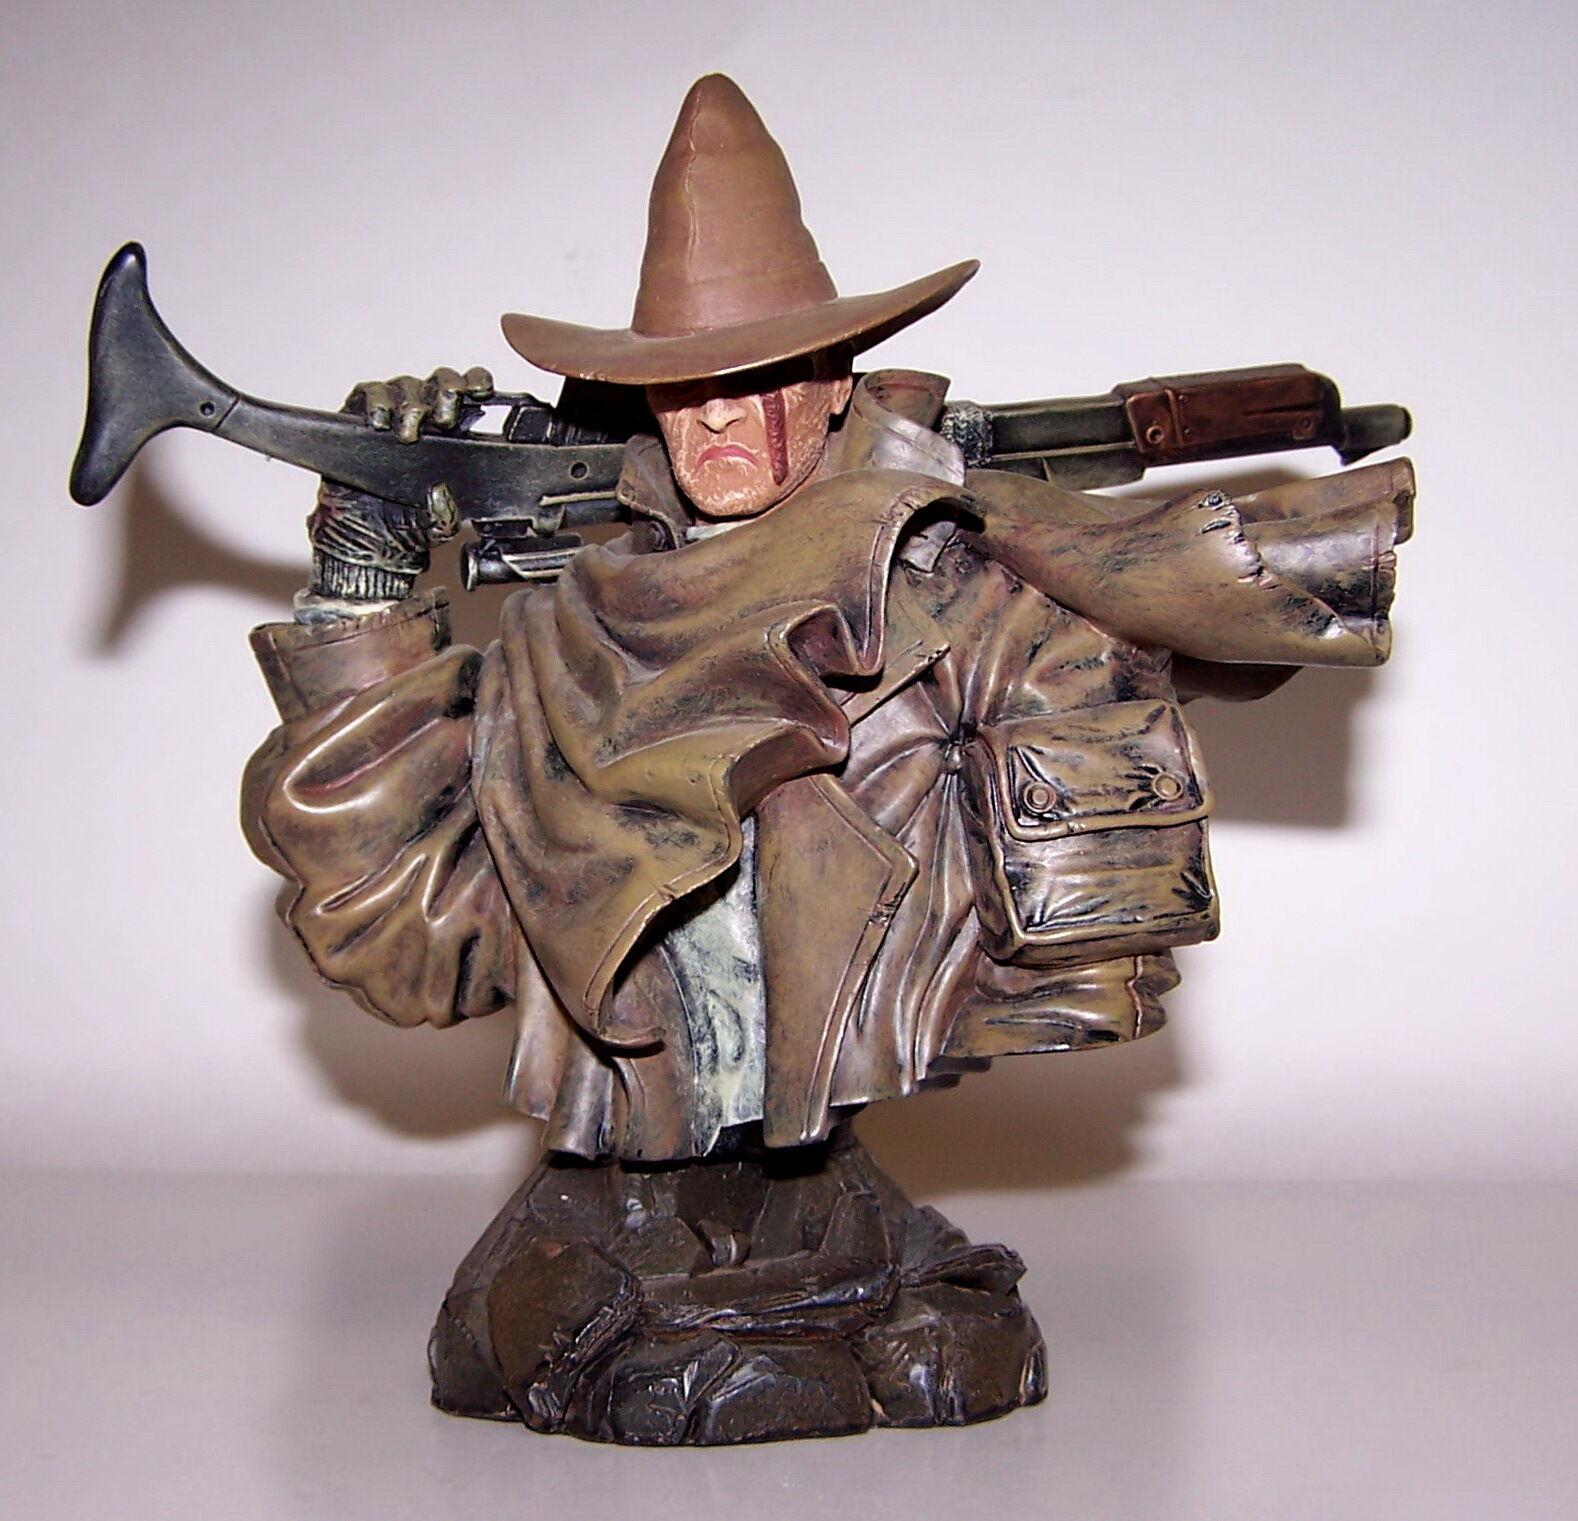 connotación de lujo discreta Solo un un un peregrino Busto de porcelana pintada a mano fría fundido le Toro Negro Nuevos En Caja 2001  cómodo